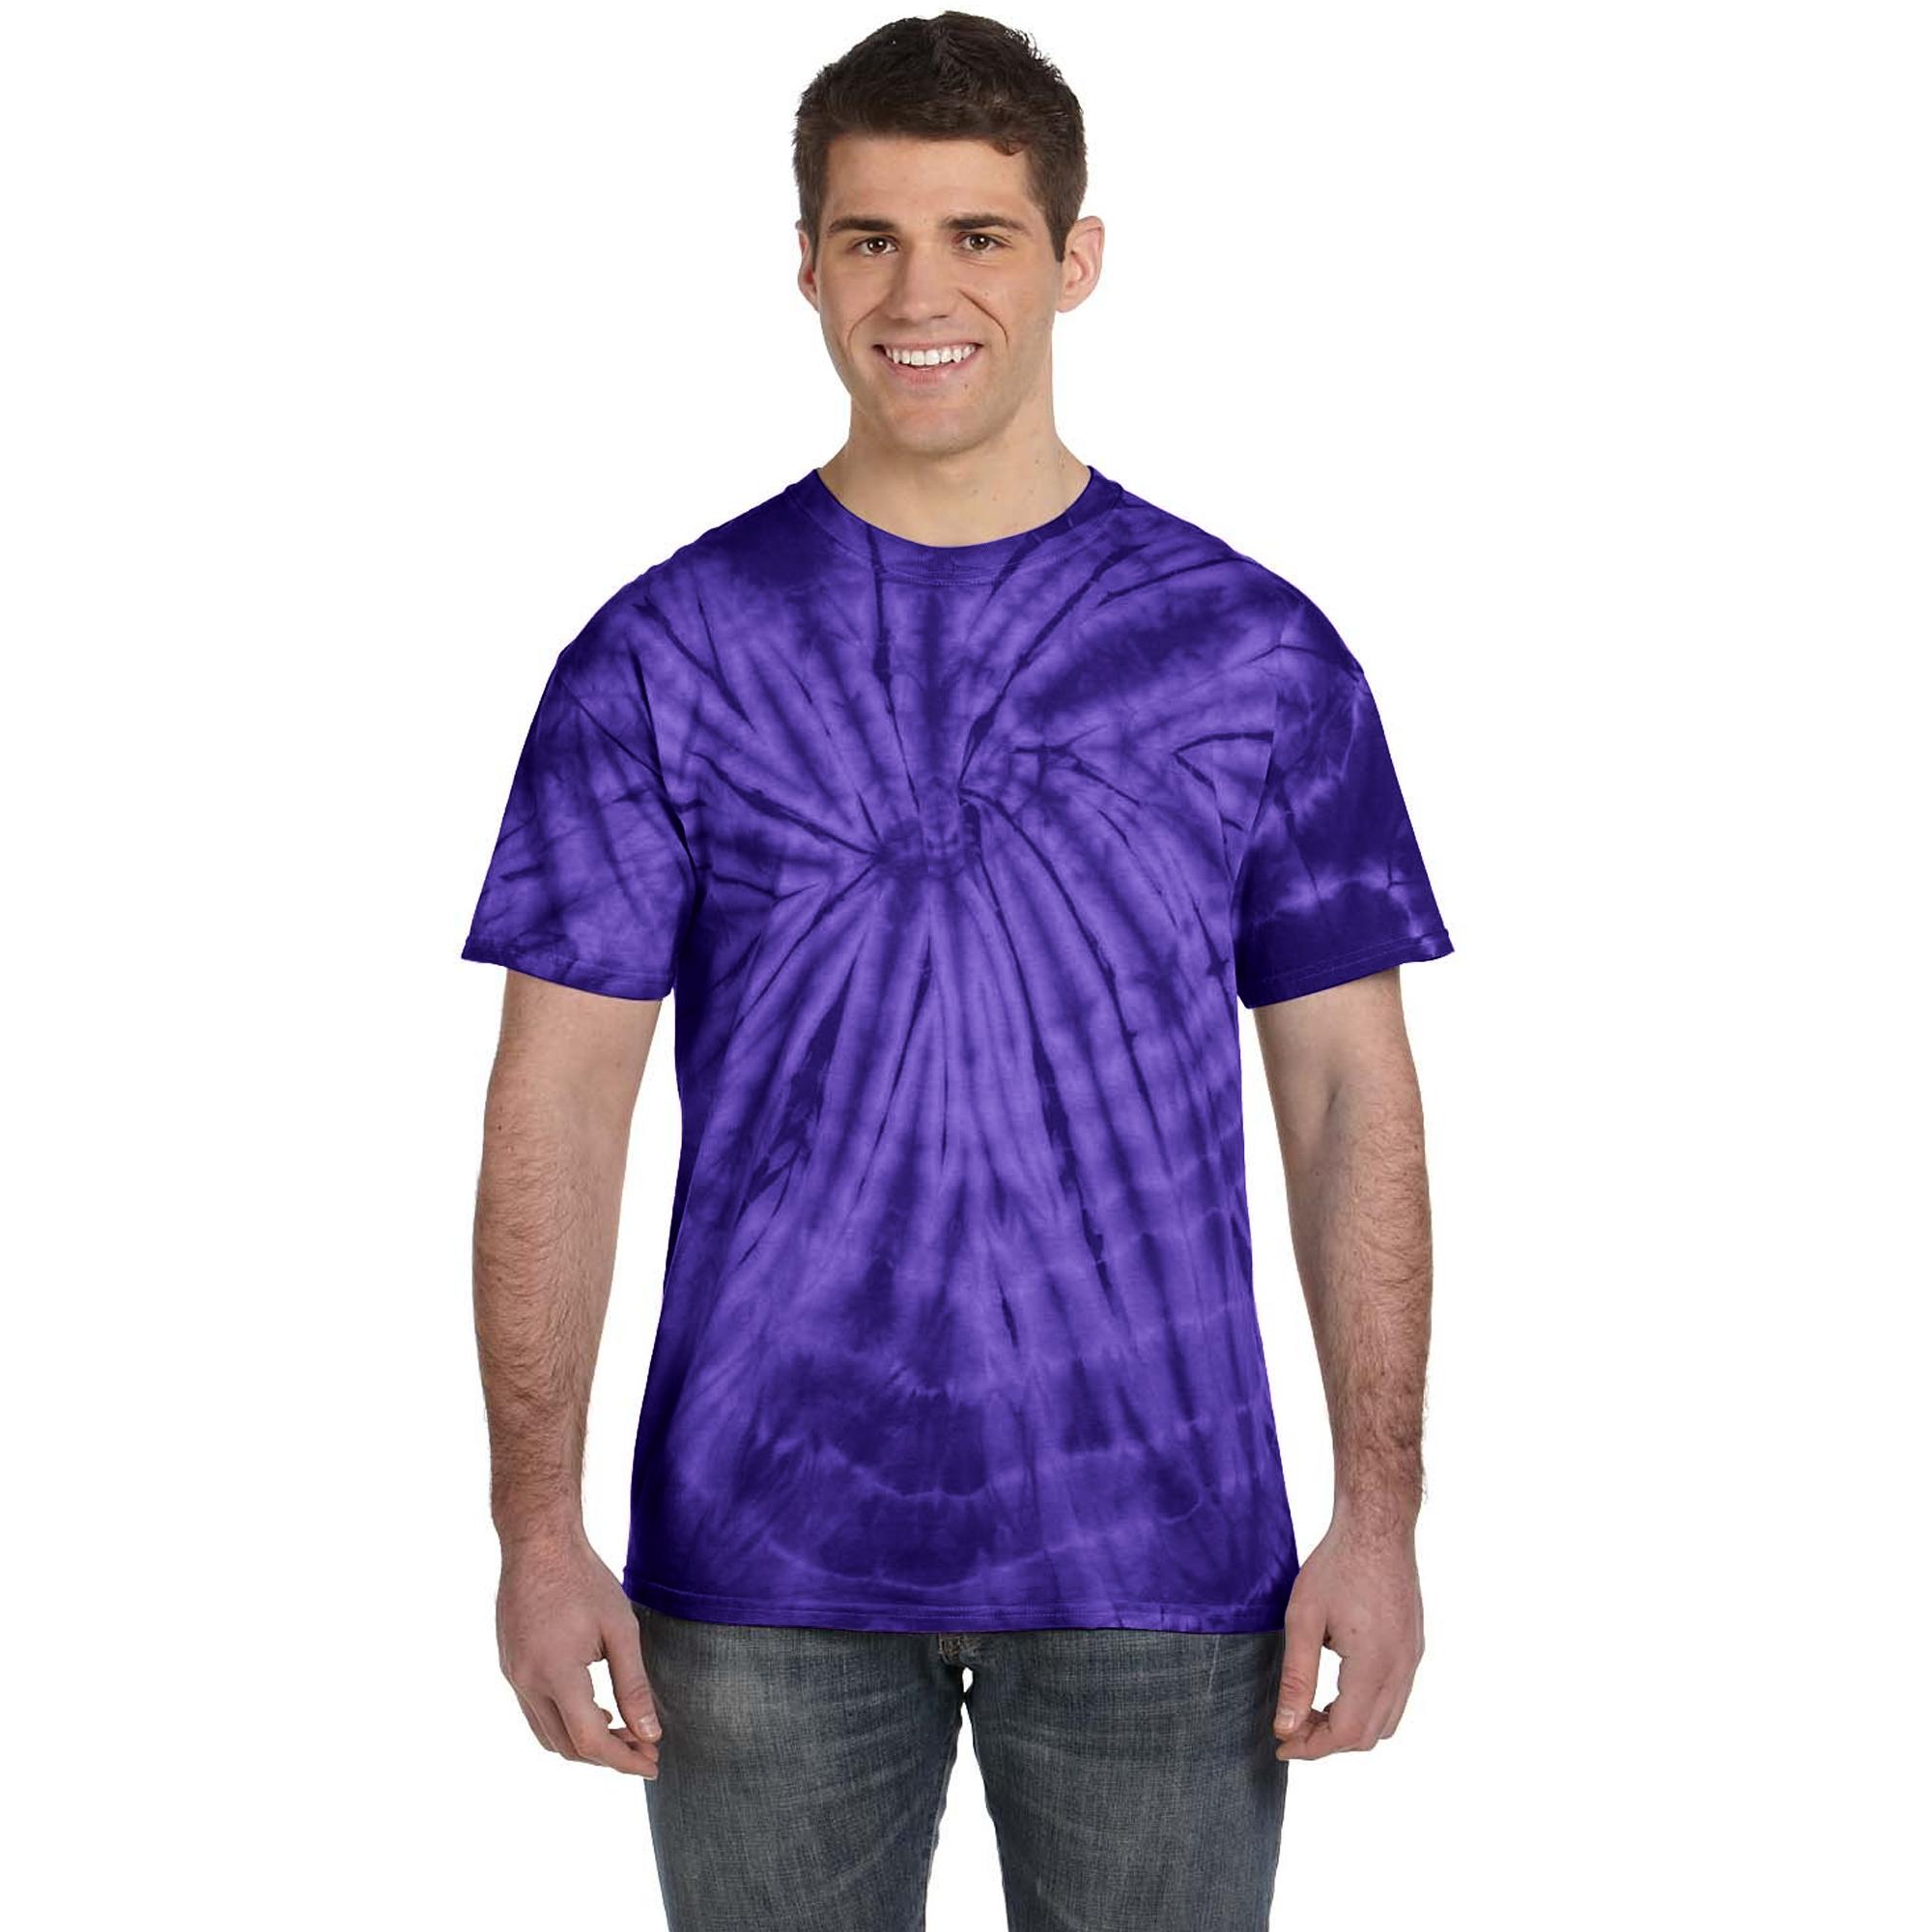 Colortone-Camiseta-psicodelica-monocolor-de-manga-corta-para-adultos-Uninex